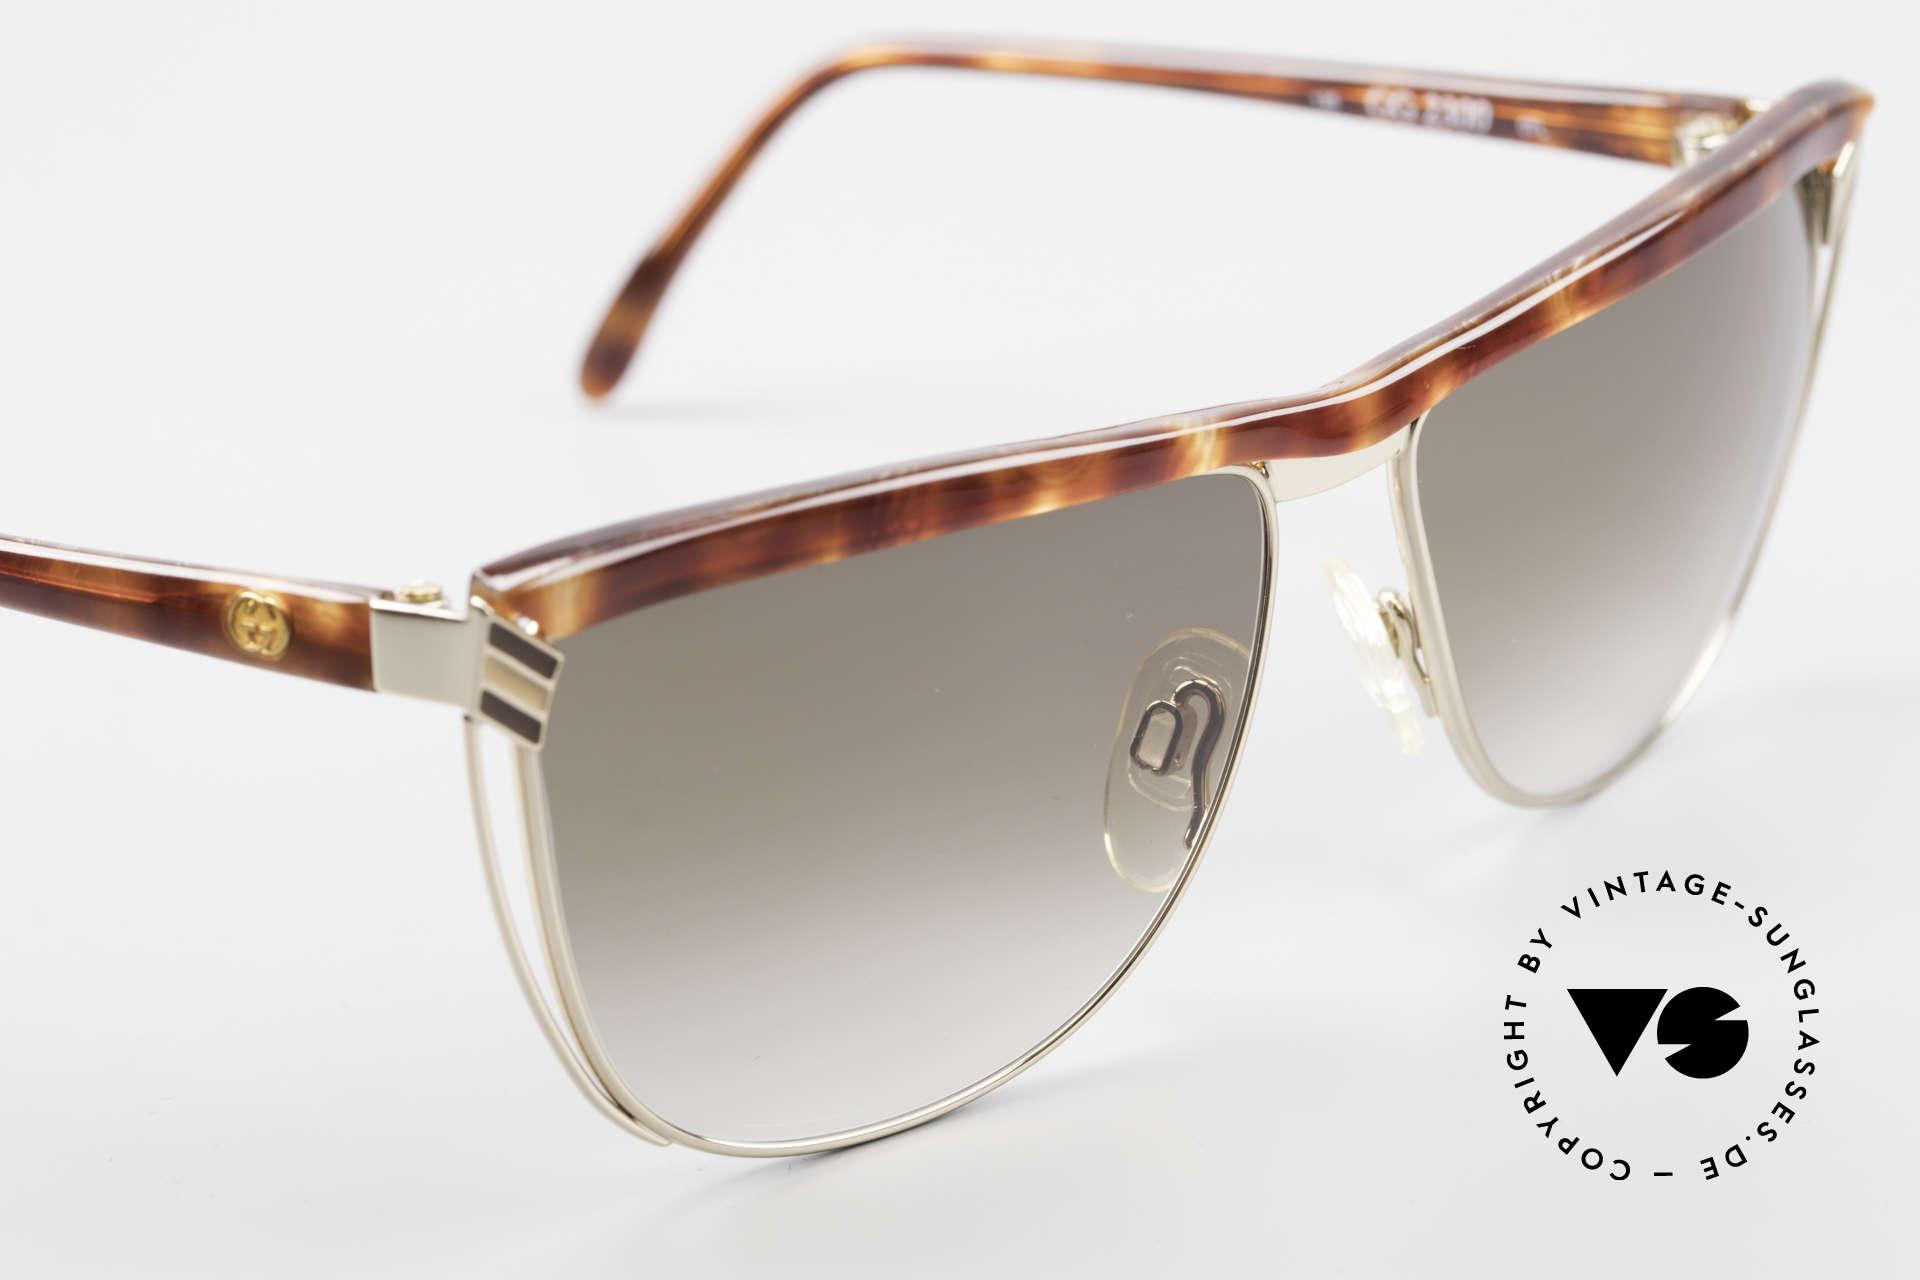 Gucci 2300 Ladies Designer Sunglasses 80s, NO RETRO fashion, but real 1980's retail commodity, Made for Women